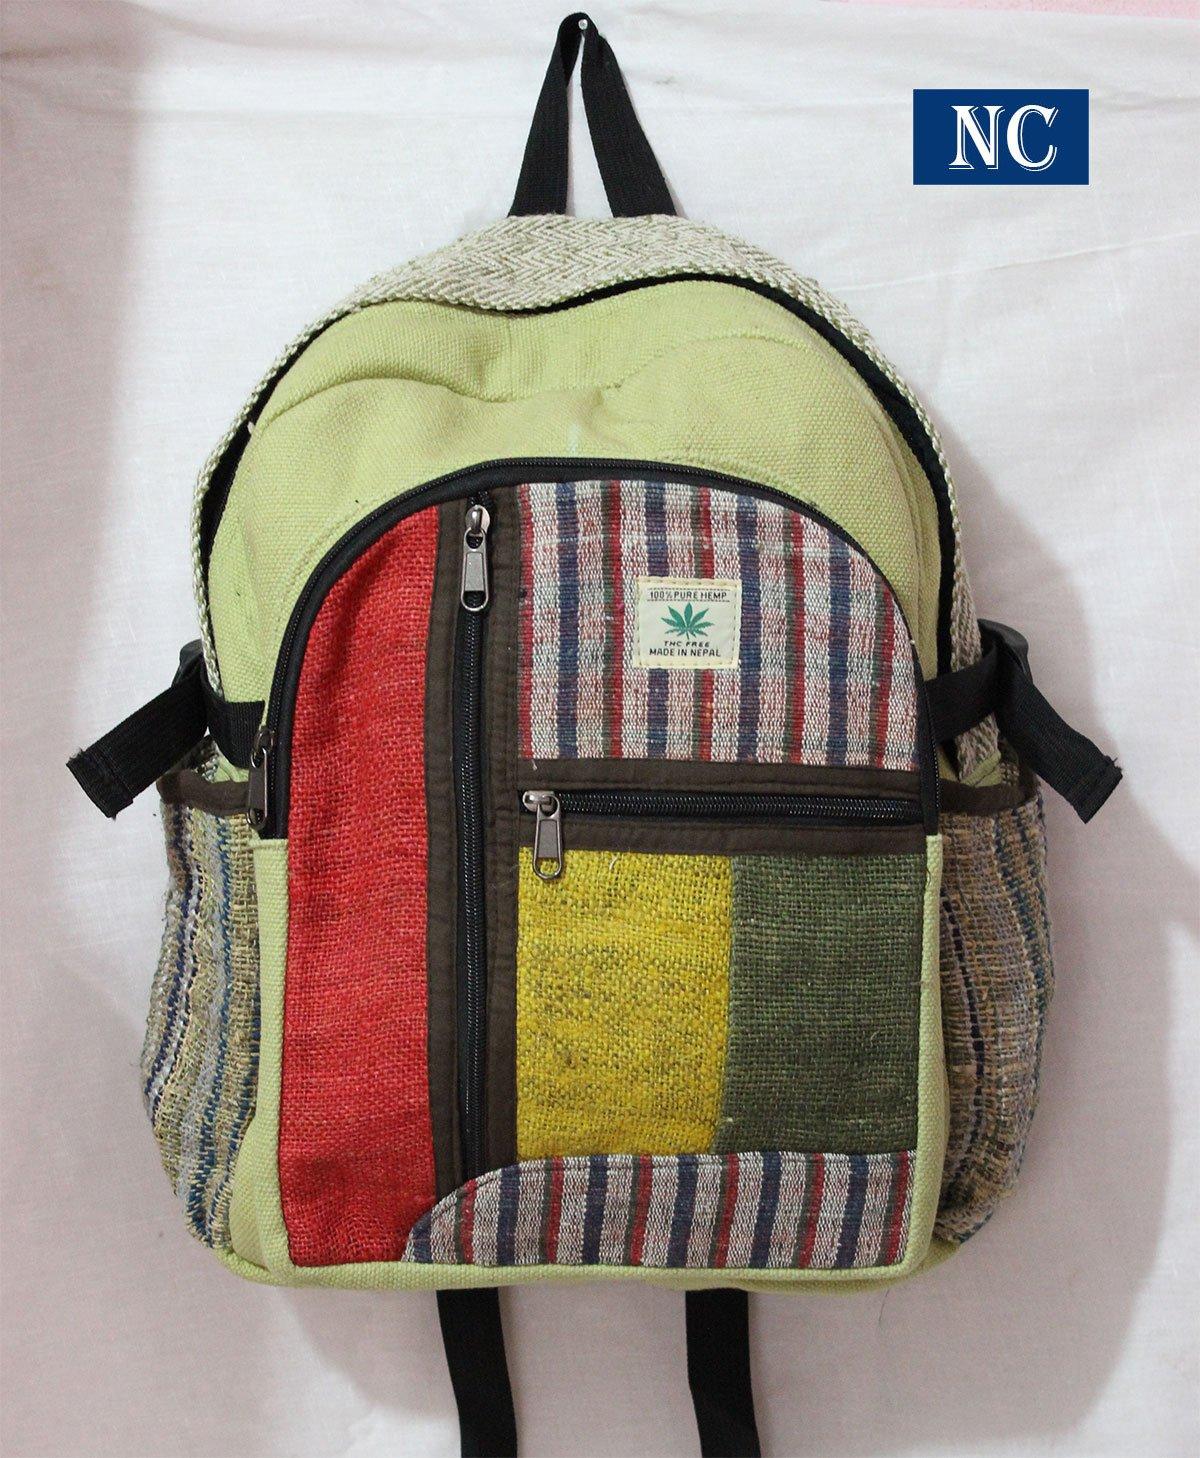 Nepali Handmade Hemp Rasta Backpack - 100% Pure Hemp (THC FREE) Backpack Handmade Nepal with Laptop Sleeve - Fashion Cute Travel School College Shoulder Bag / Bookbags / Daypack